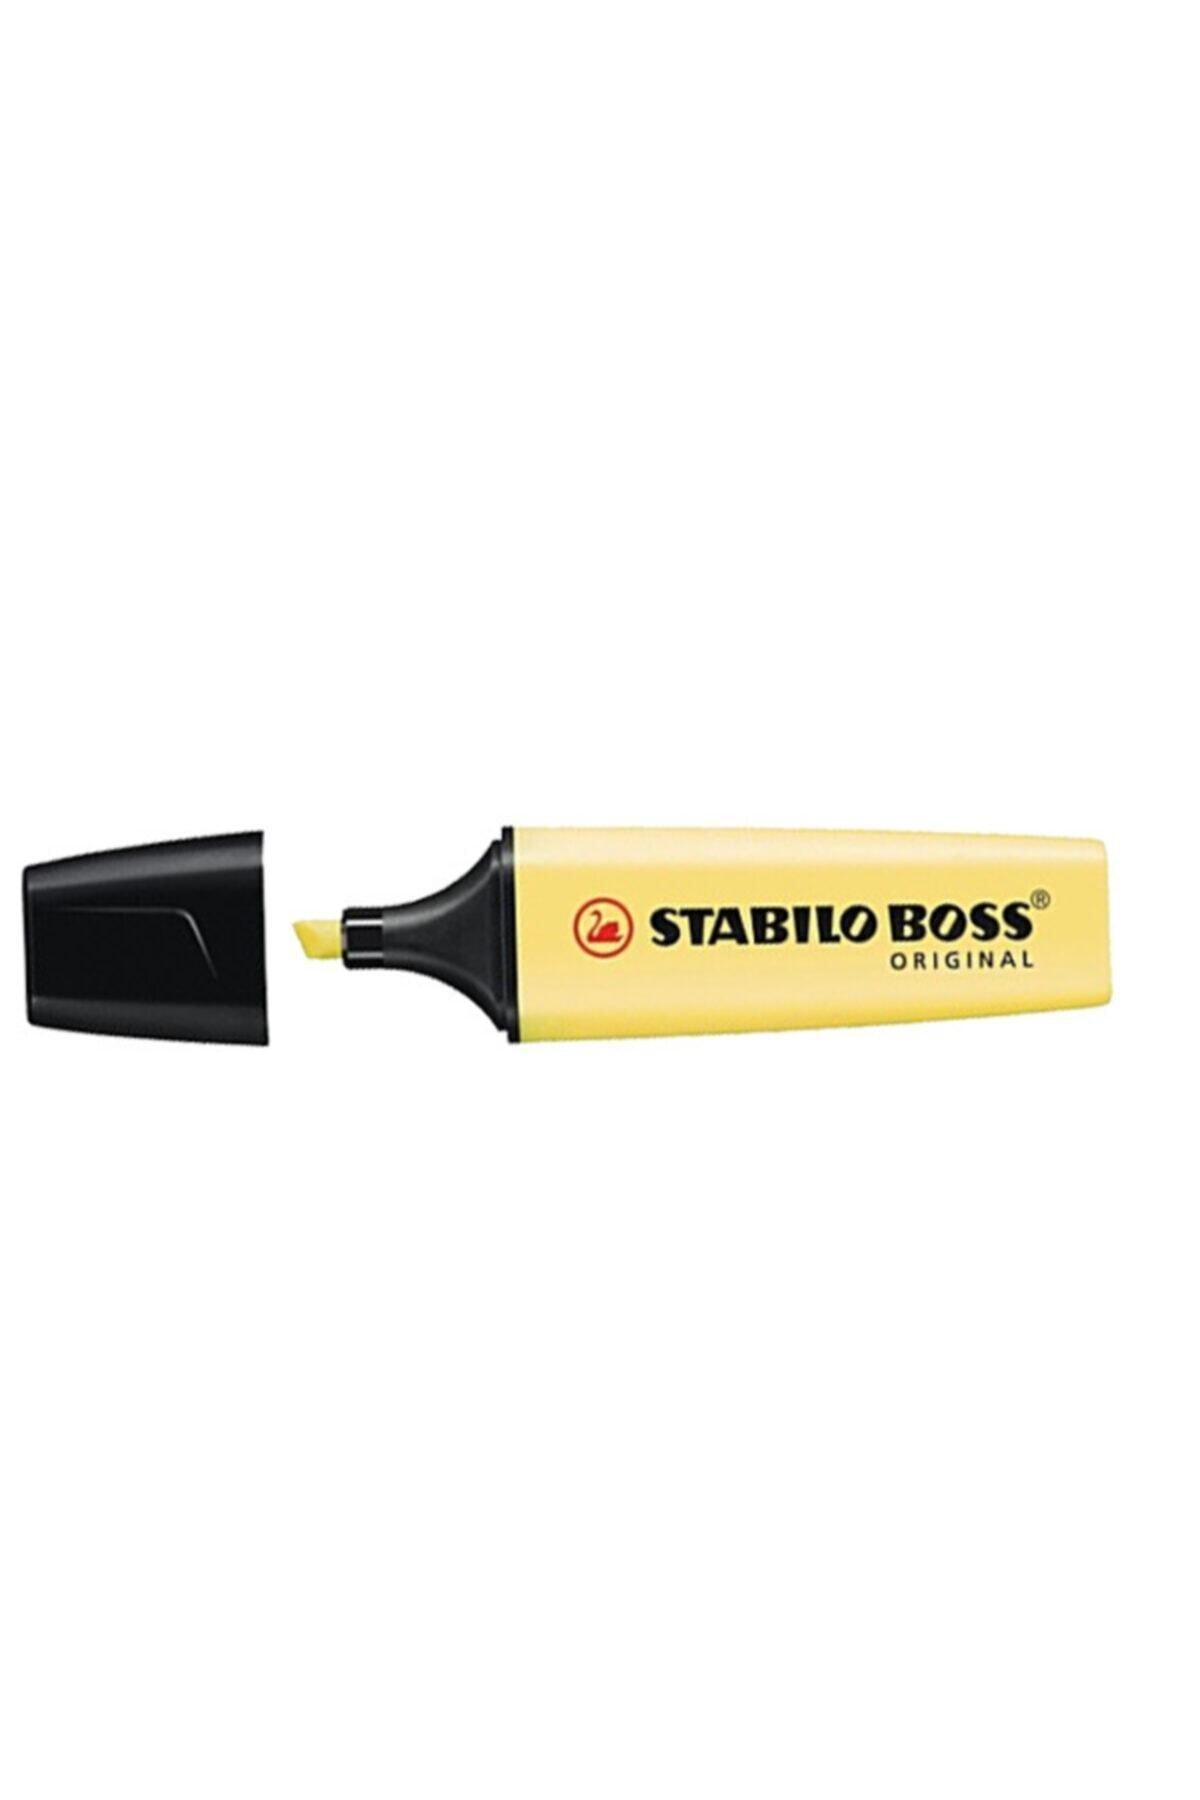 Stabilo Sarı Boss Original Fosforlu Kalem Pastel 70-144 1